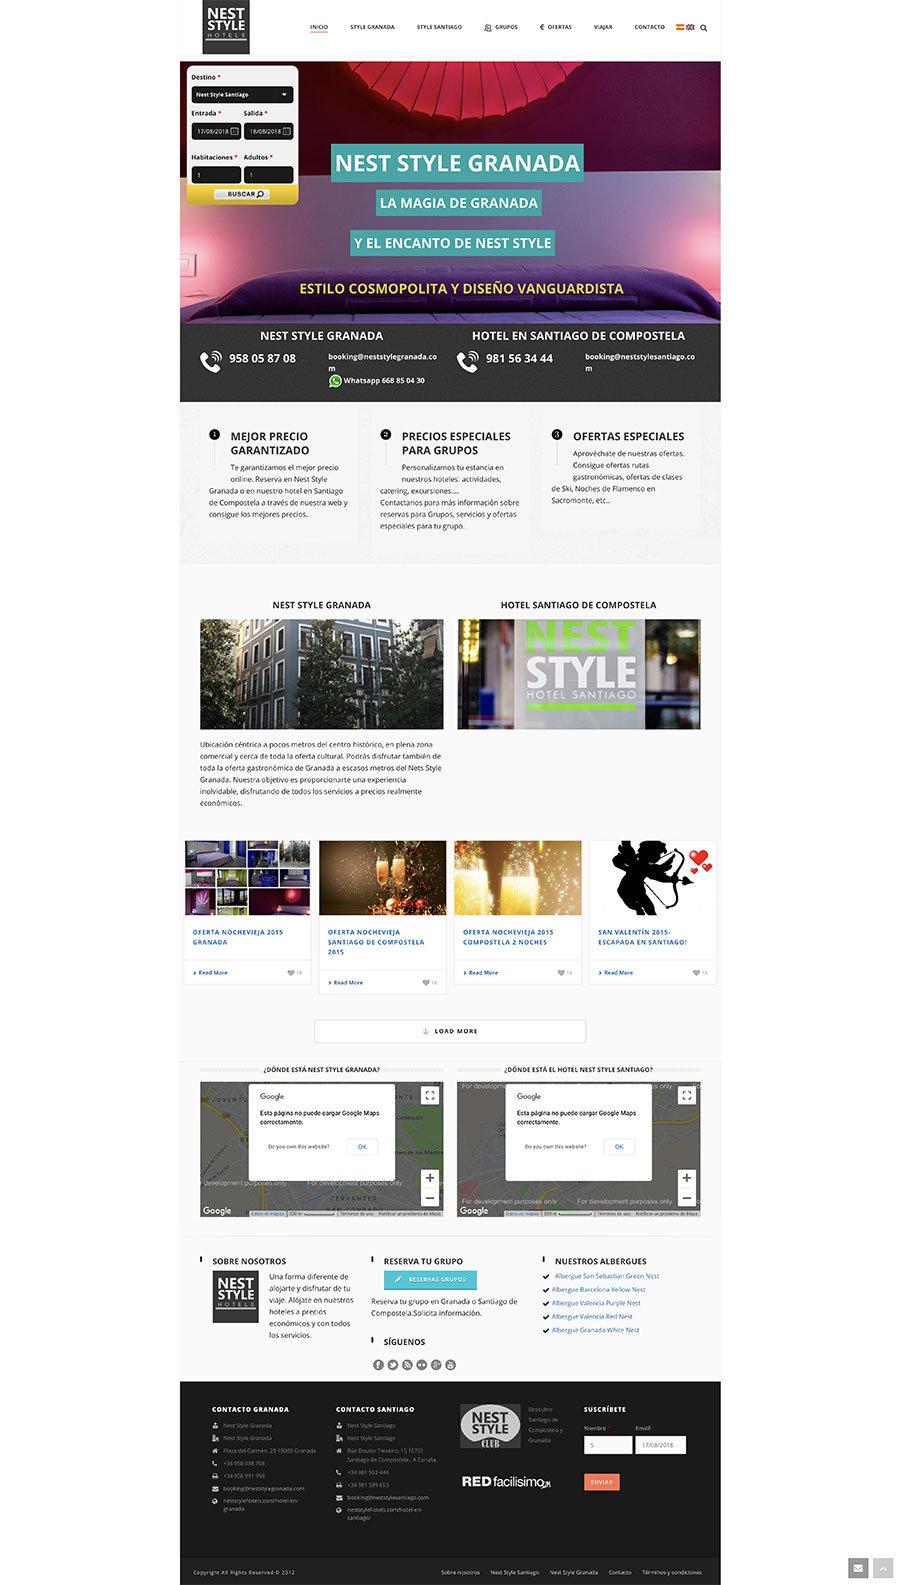 Wellaggio-diseño-web-valencia-neststylehotels-2018-08-16-16_56_31